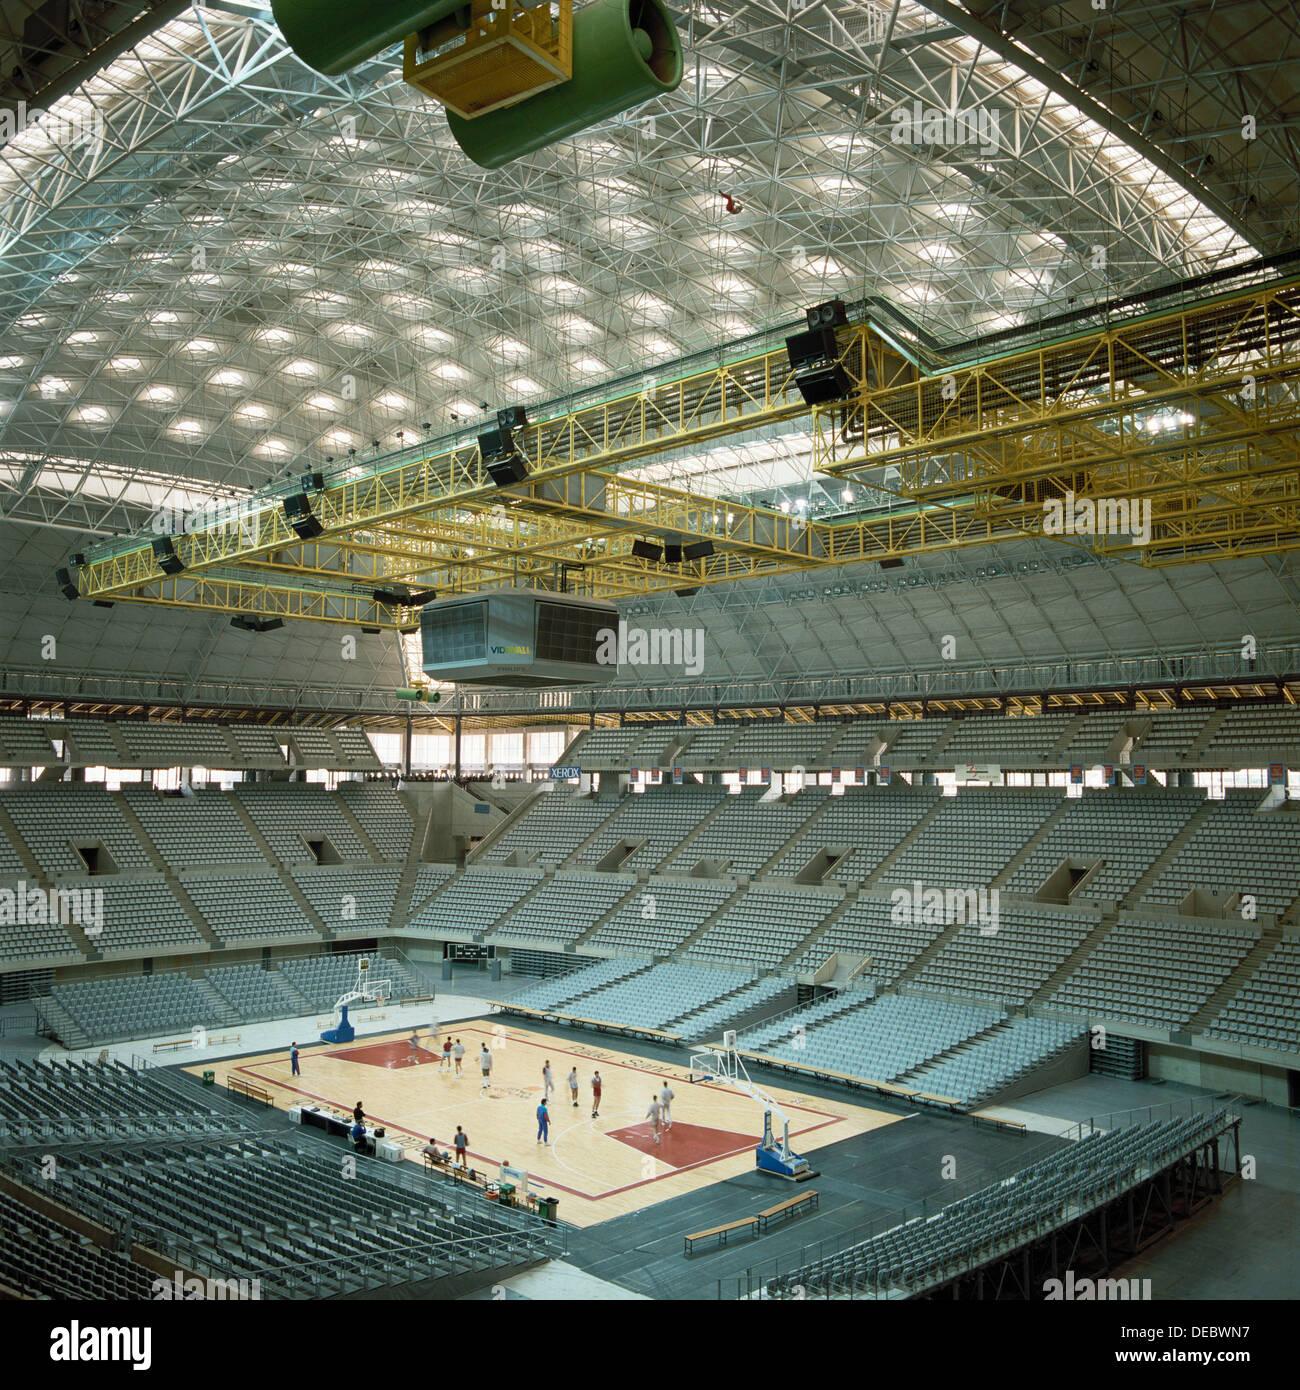 Palau sant jordi montjuich olympic area barcelona spain for Piscinas sant jordi barcelona